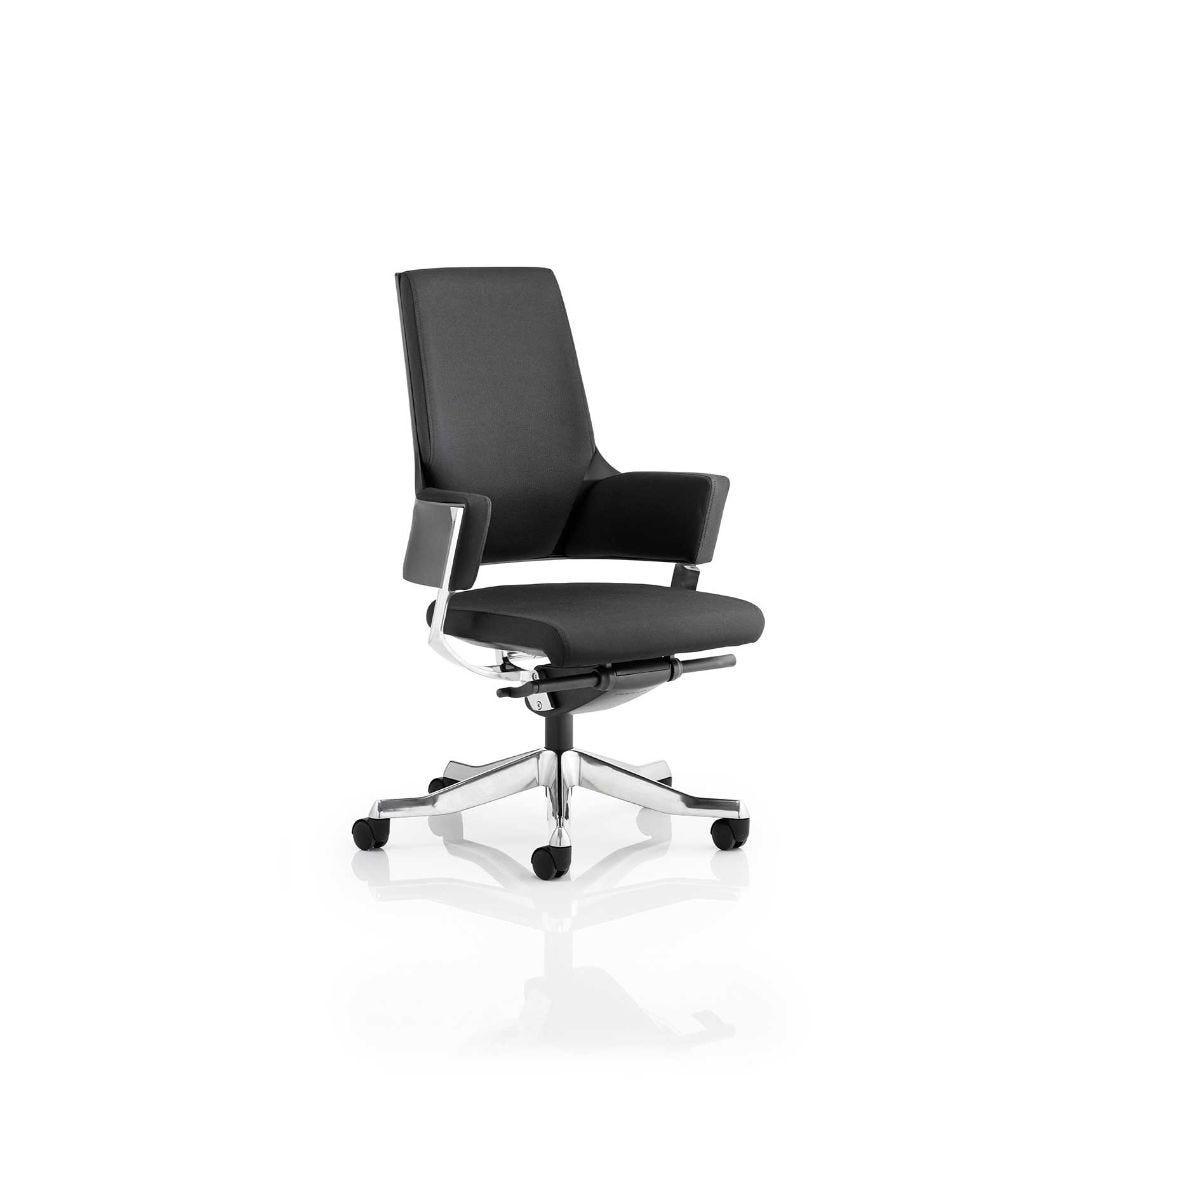 Enterprise Executive Office Chair, Black